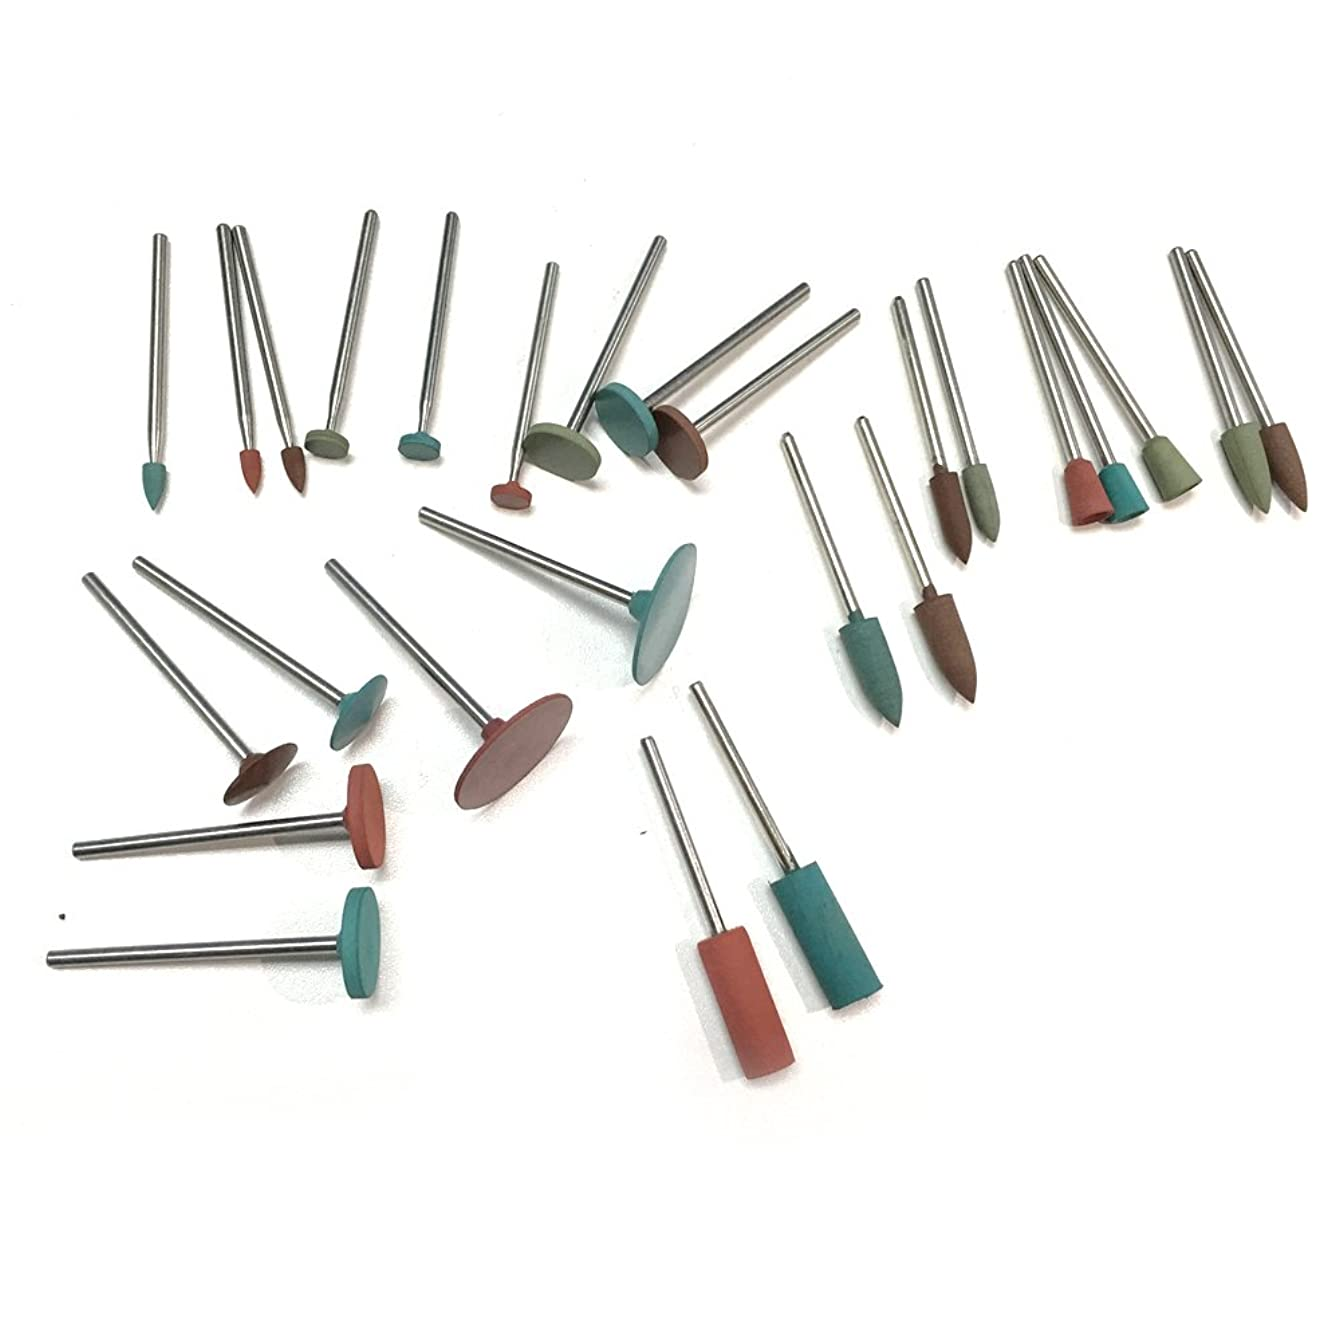 PHYHOO Jewelry Tool Rubber Rotary Tools Polishing Burr Dremel 26pcs Diamond-in-Rubber Emery Polishing Bit Set - Fits Dremel - Metal, Glass, Stone, Tile